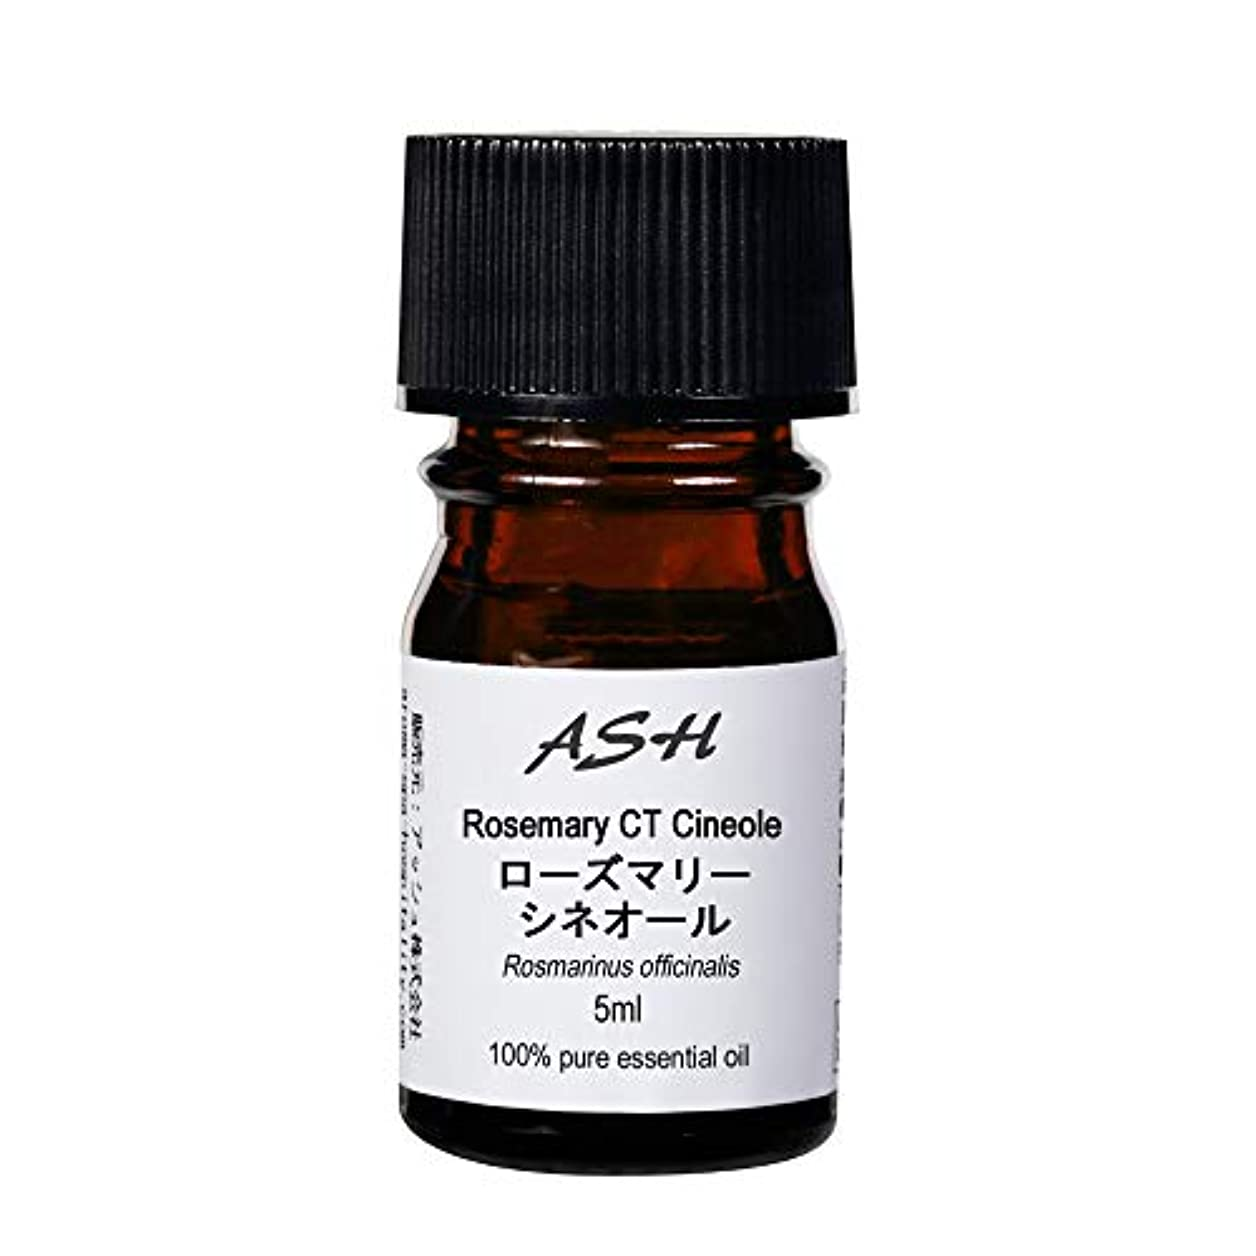 ASH ローズマリー (CT シネオール) エッセンシャルオイル 5ml AEAJ表示基準適合認定精油